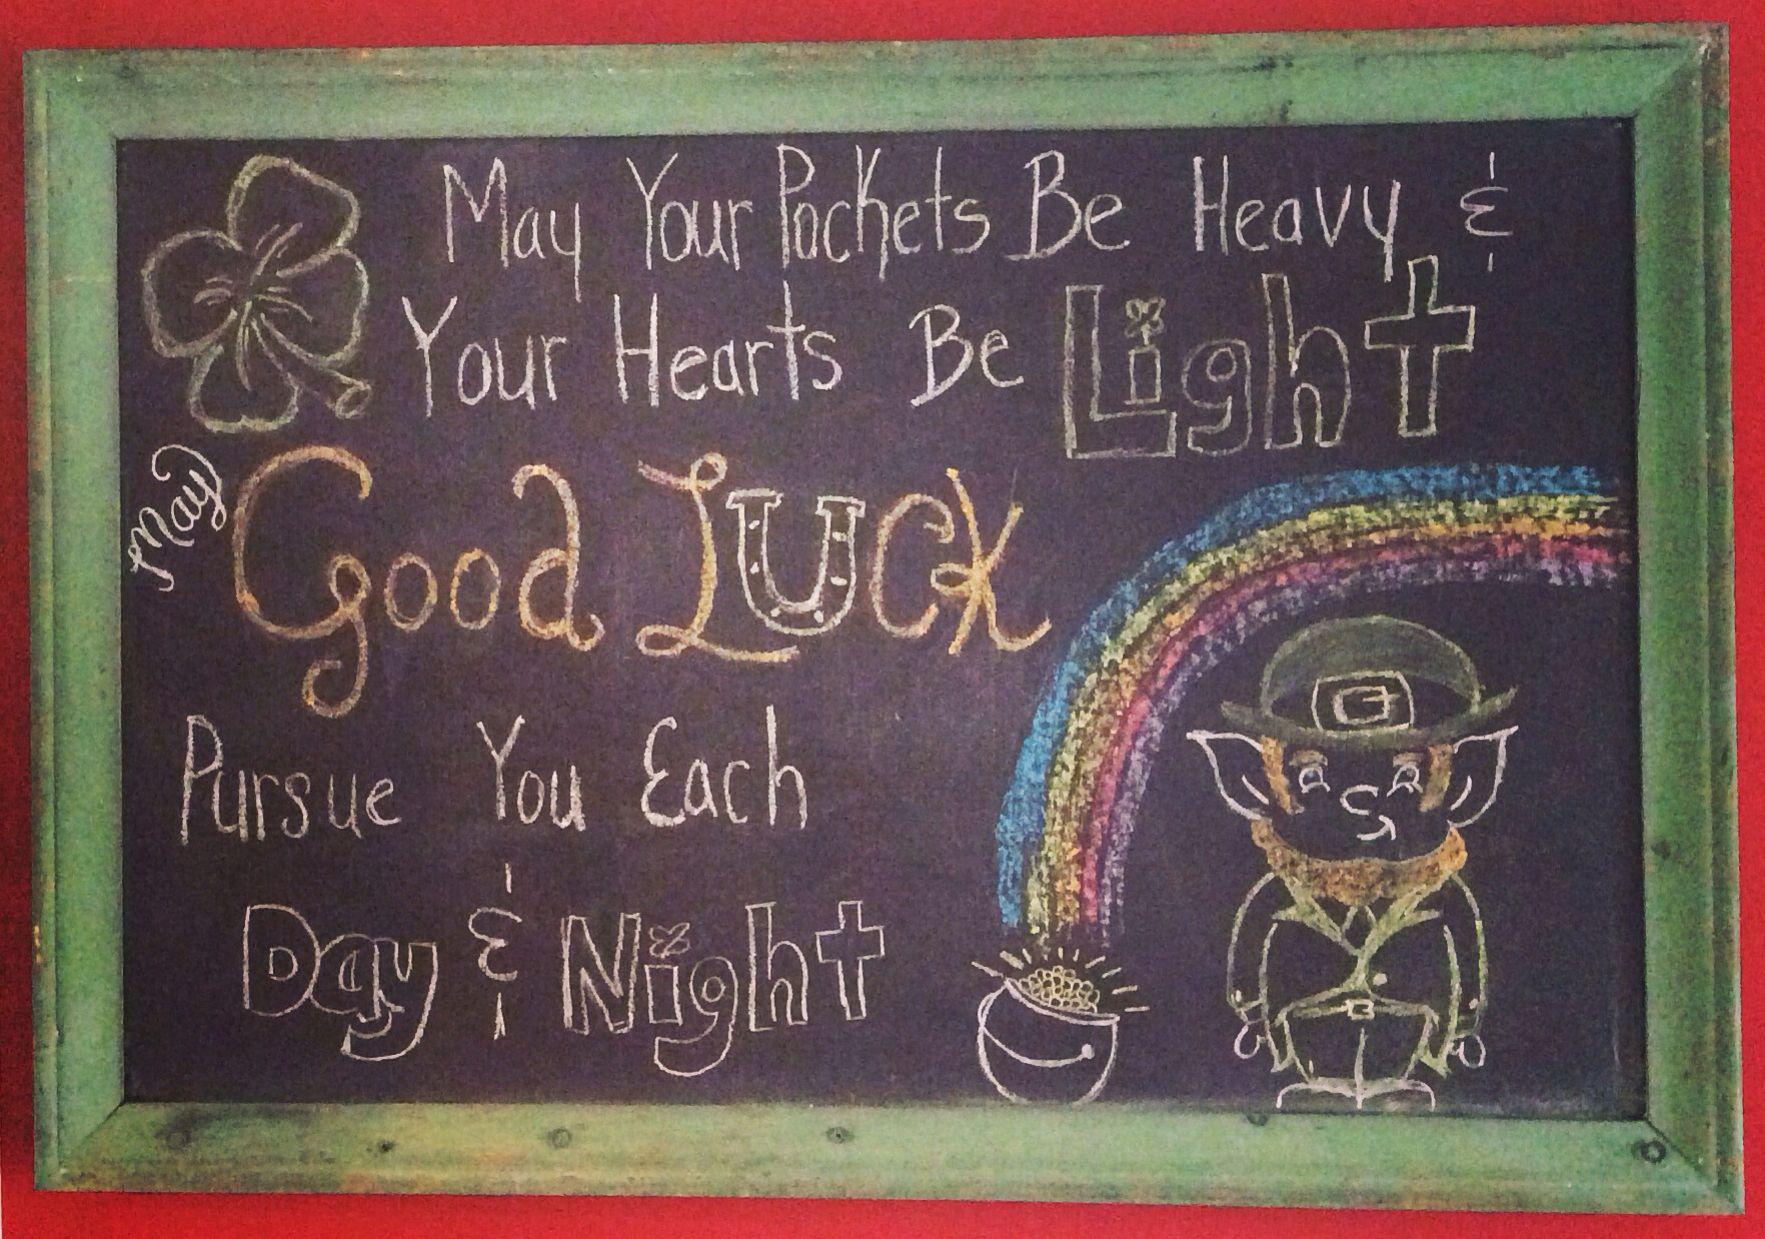 My St. Patricks Day chalkboard, march | My chalkboard fun ...